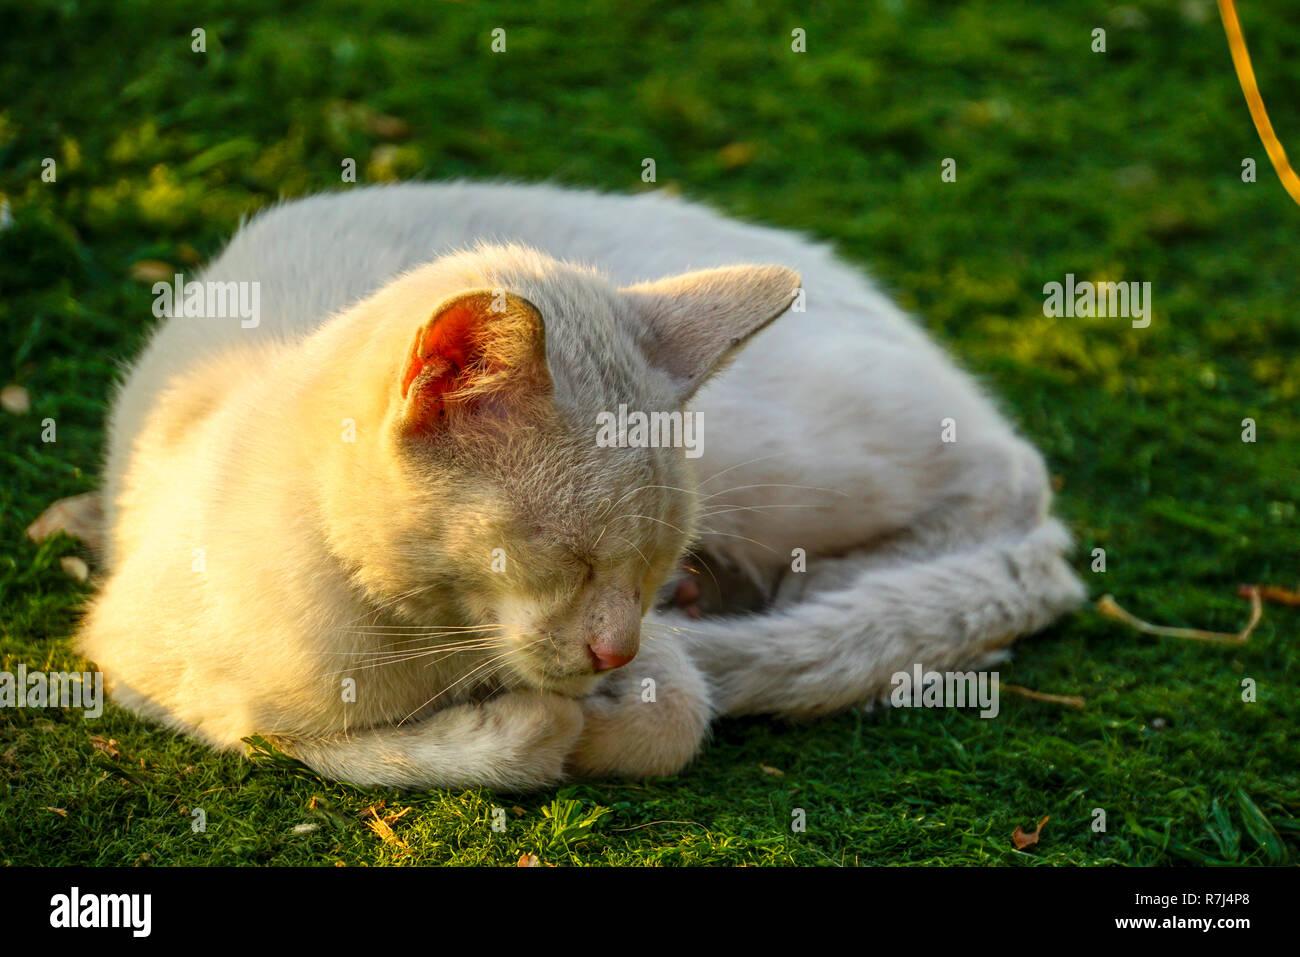 White domestic cat sleeps on green grass - Stock Image